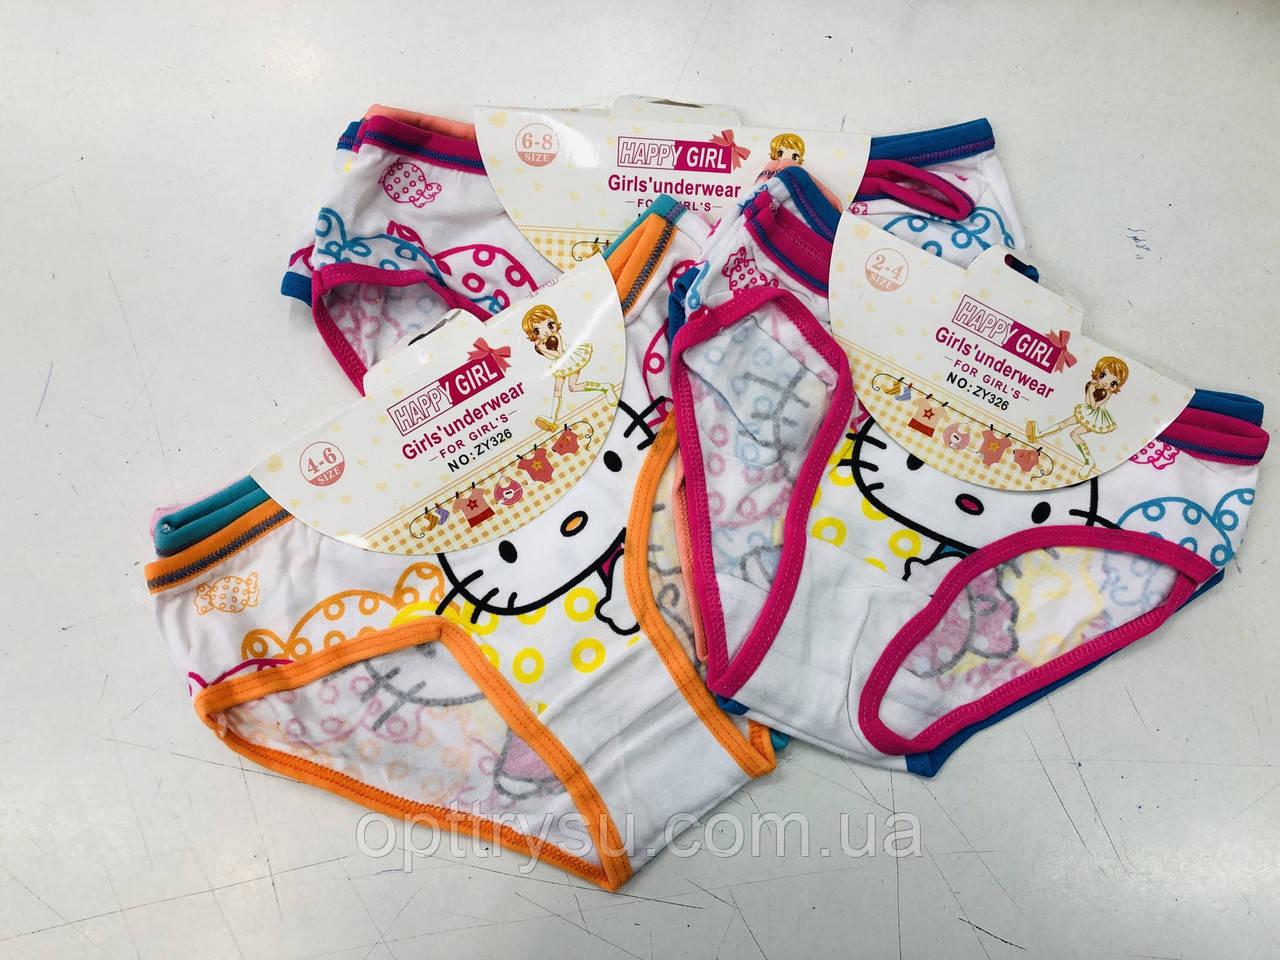 Трусики детские i ростовка Hello Kitty 2-10 лет